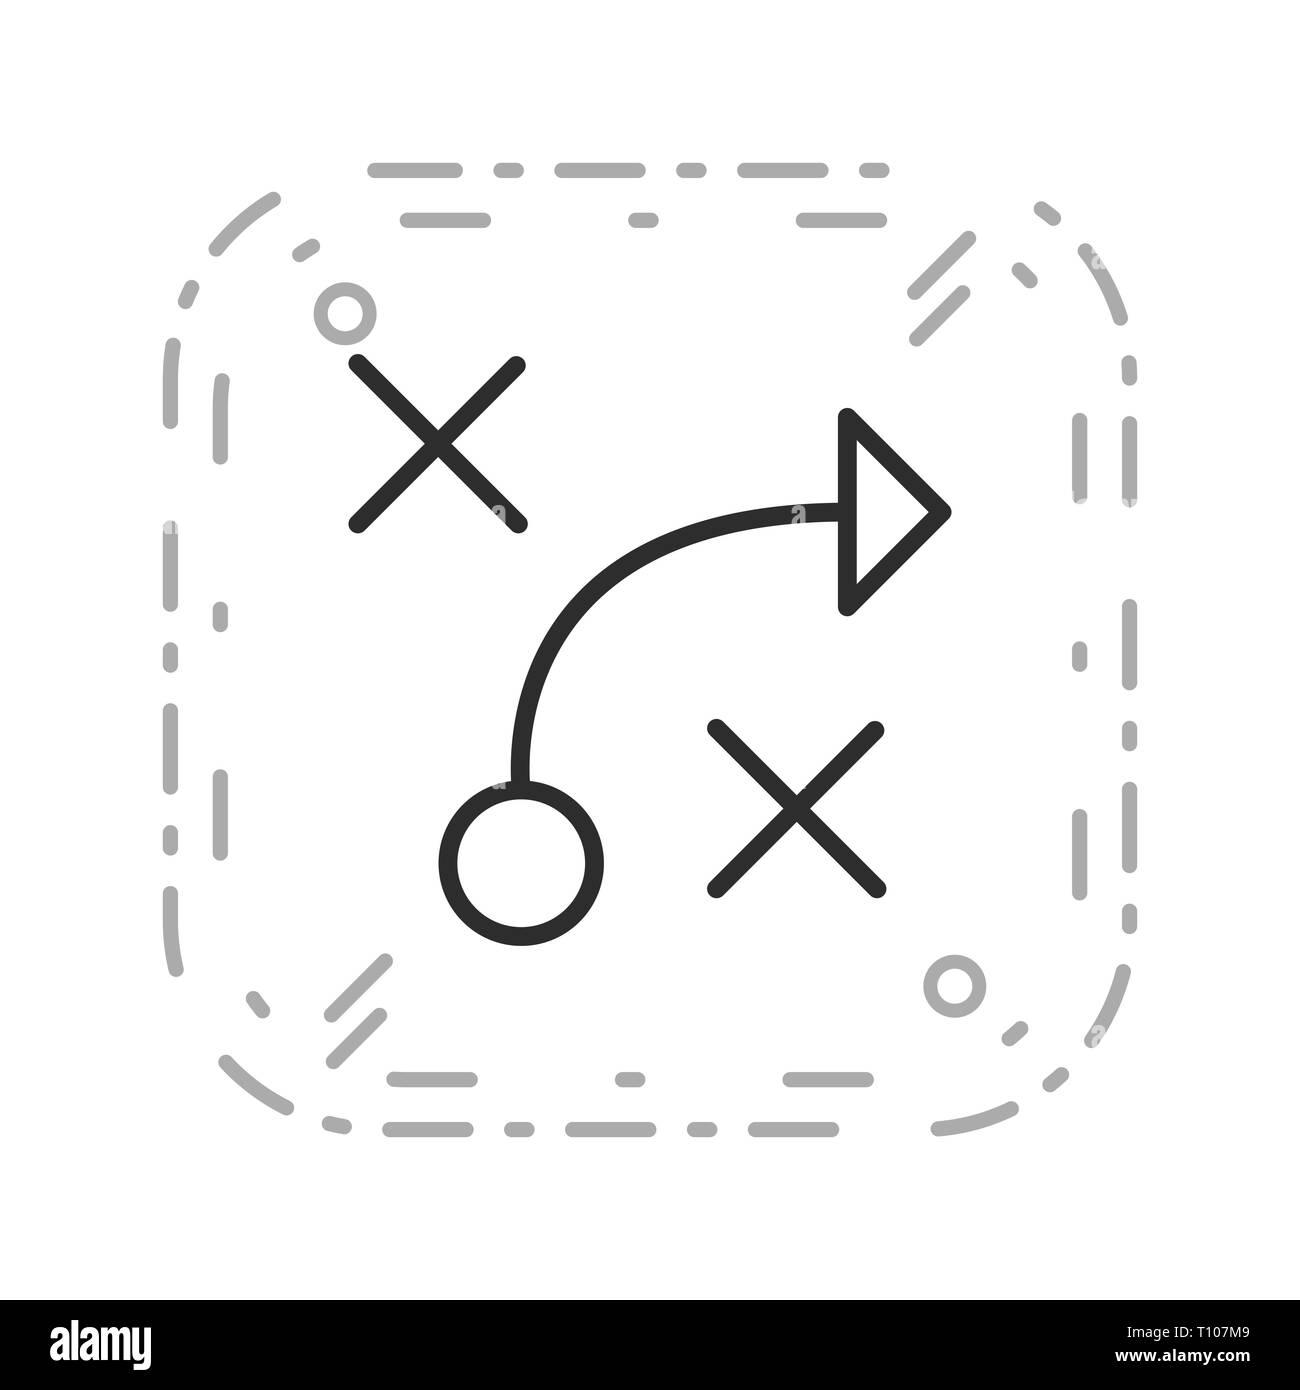 Illustration Tactics  Icon - Stock Image